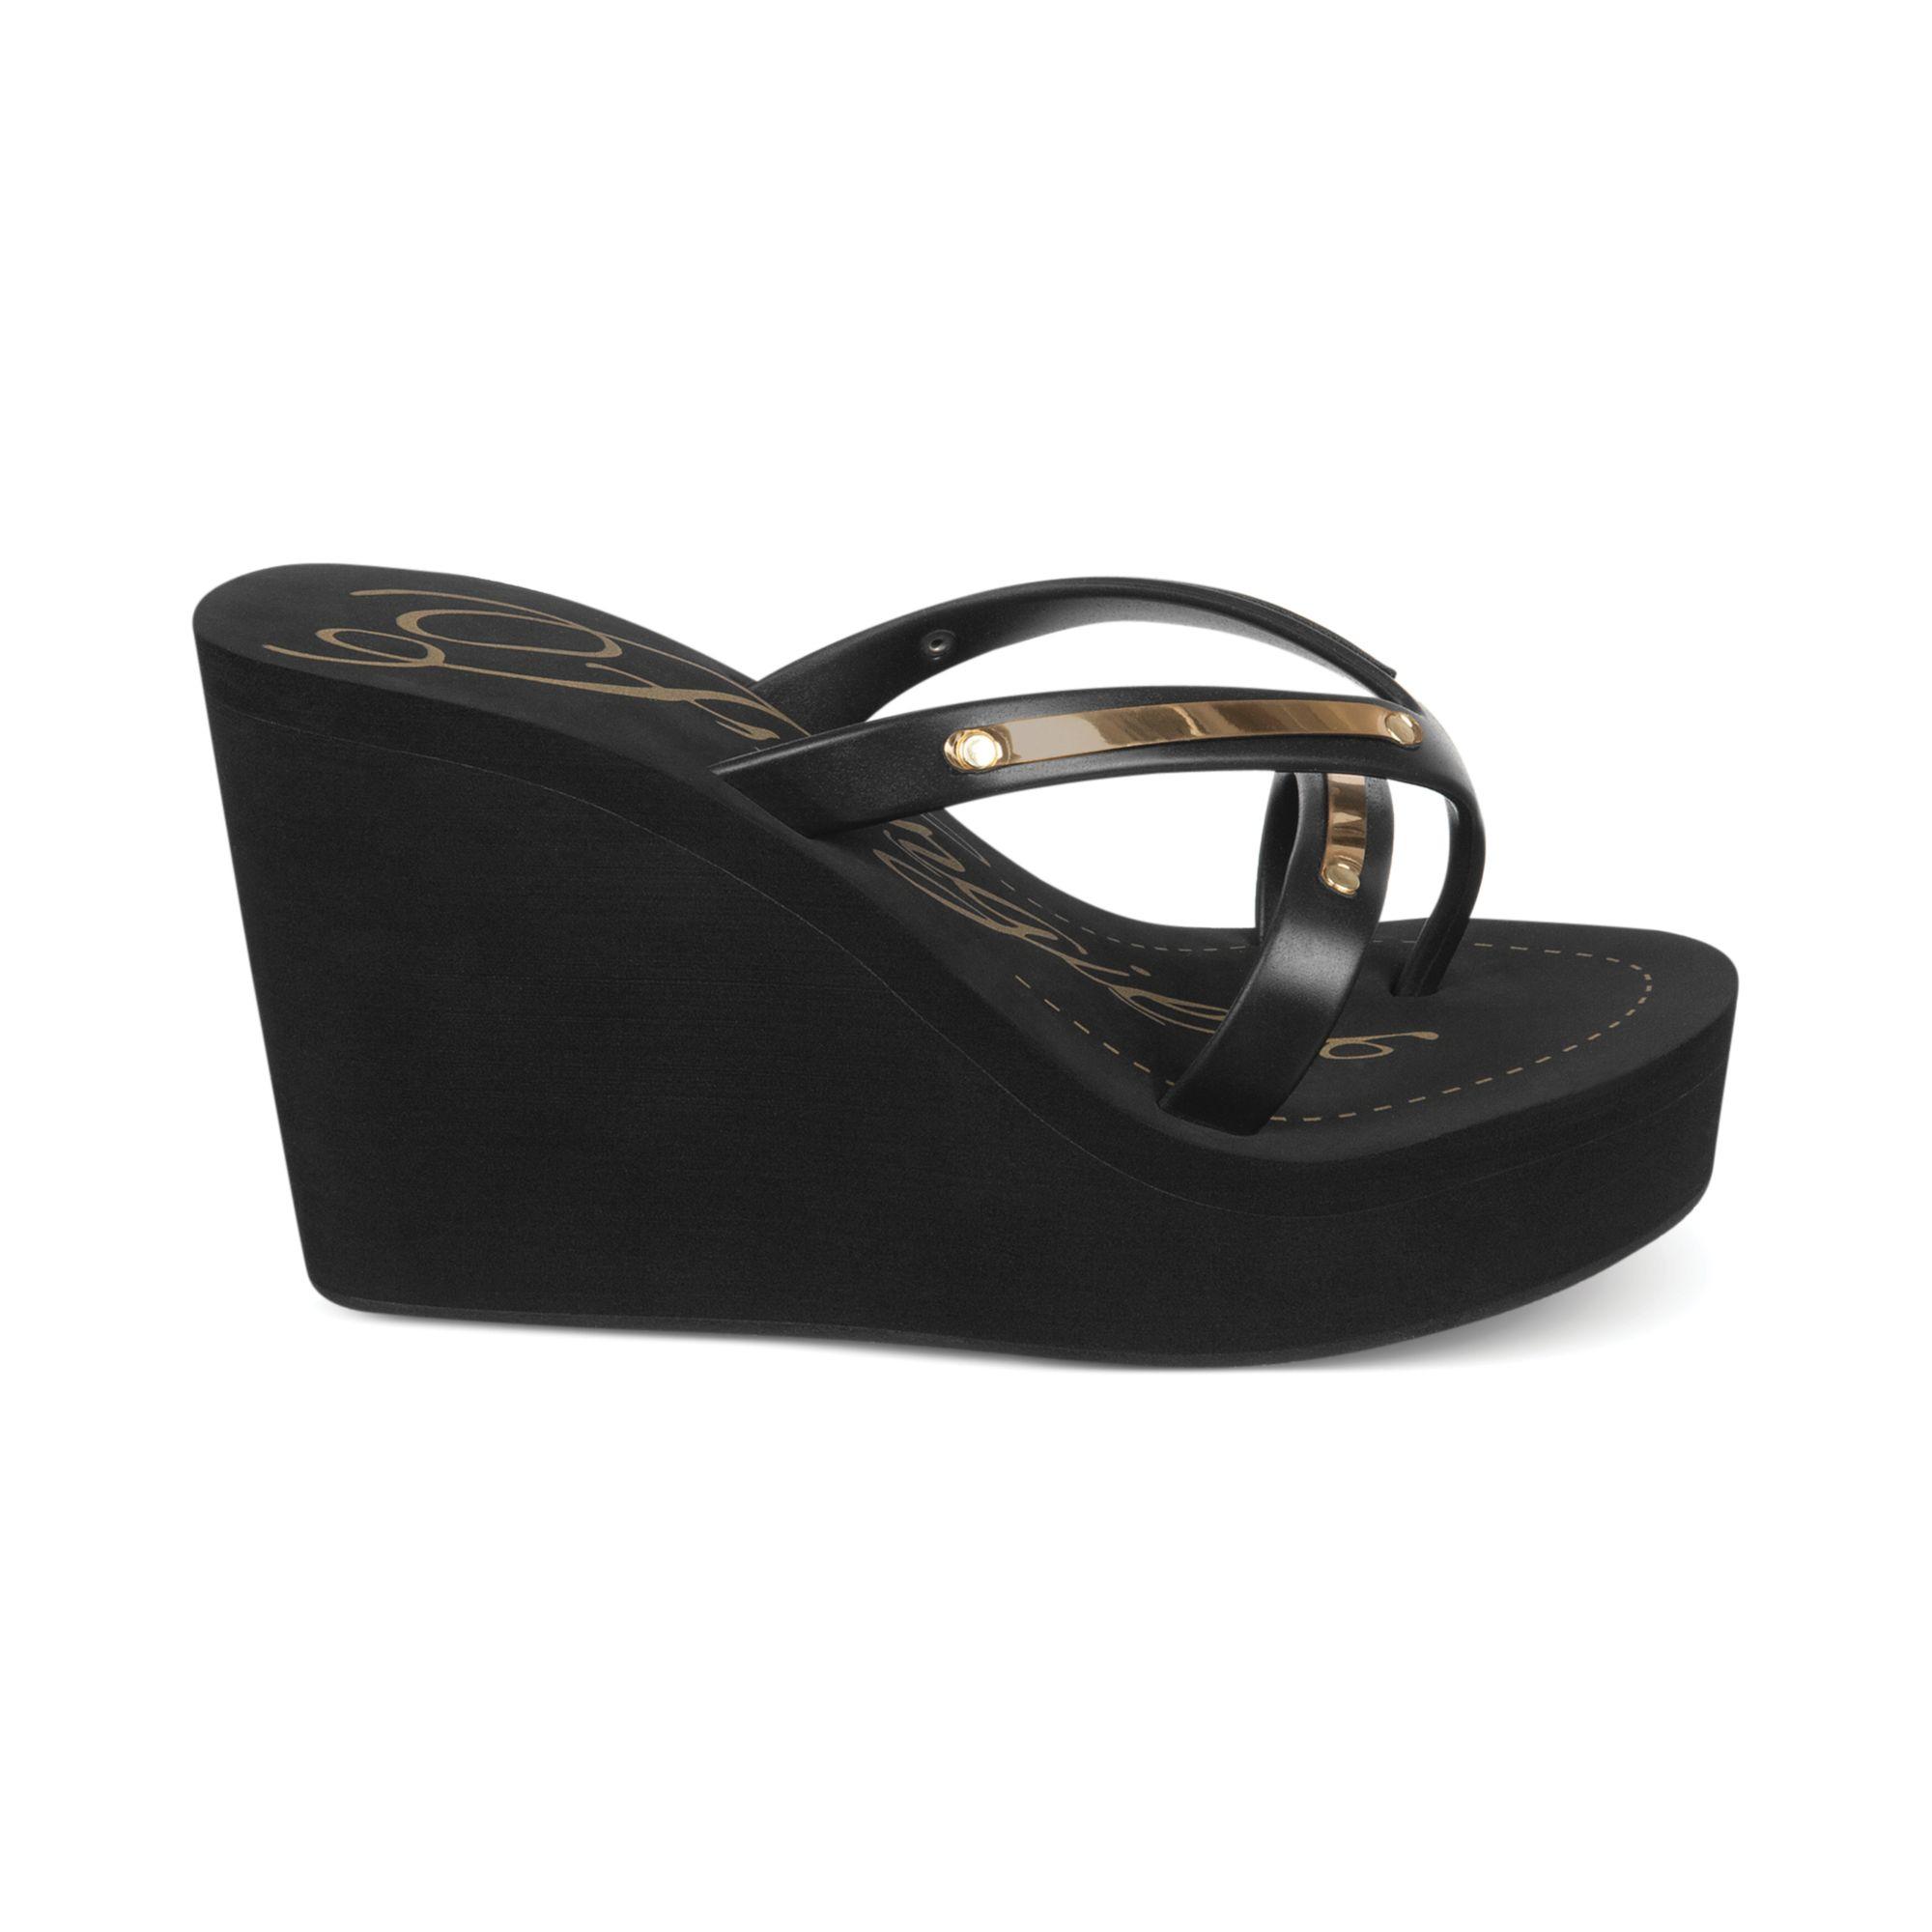 fergie eloise platform wedge sandals in black black